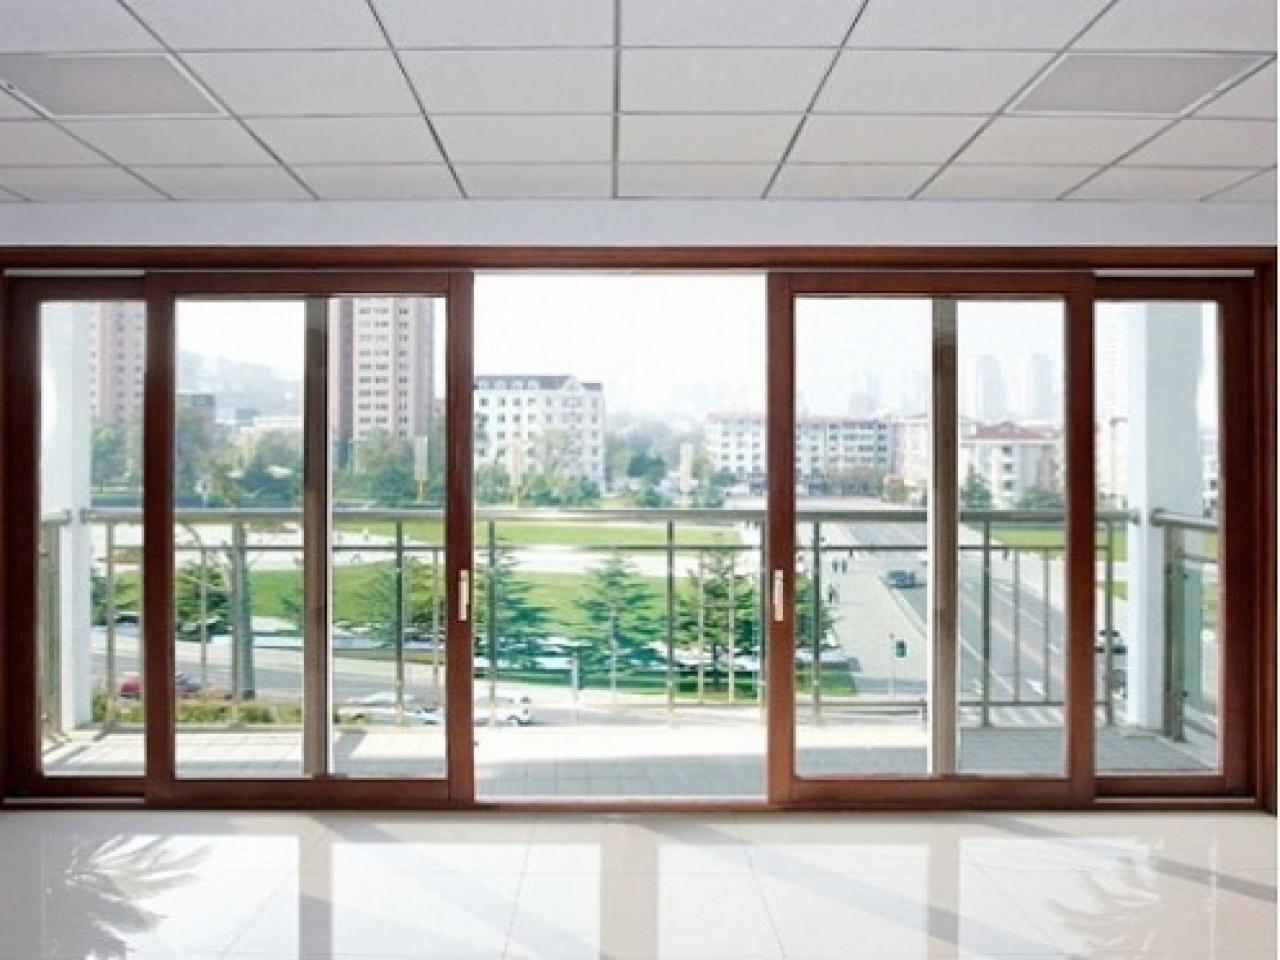 Sliding Glass Patio Doorsgood sliding glass patio doors installing sliding glass patio